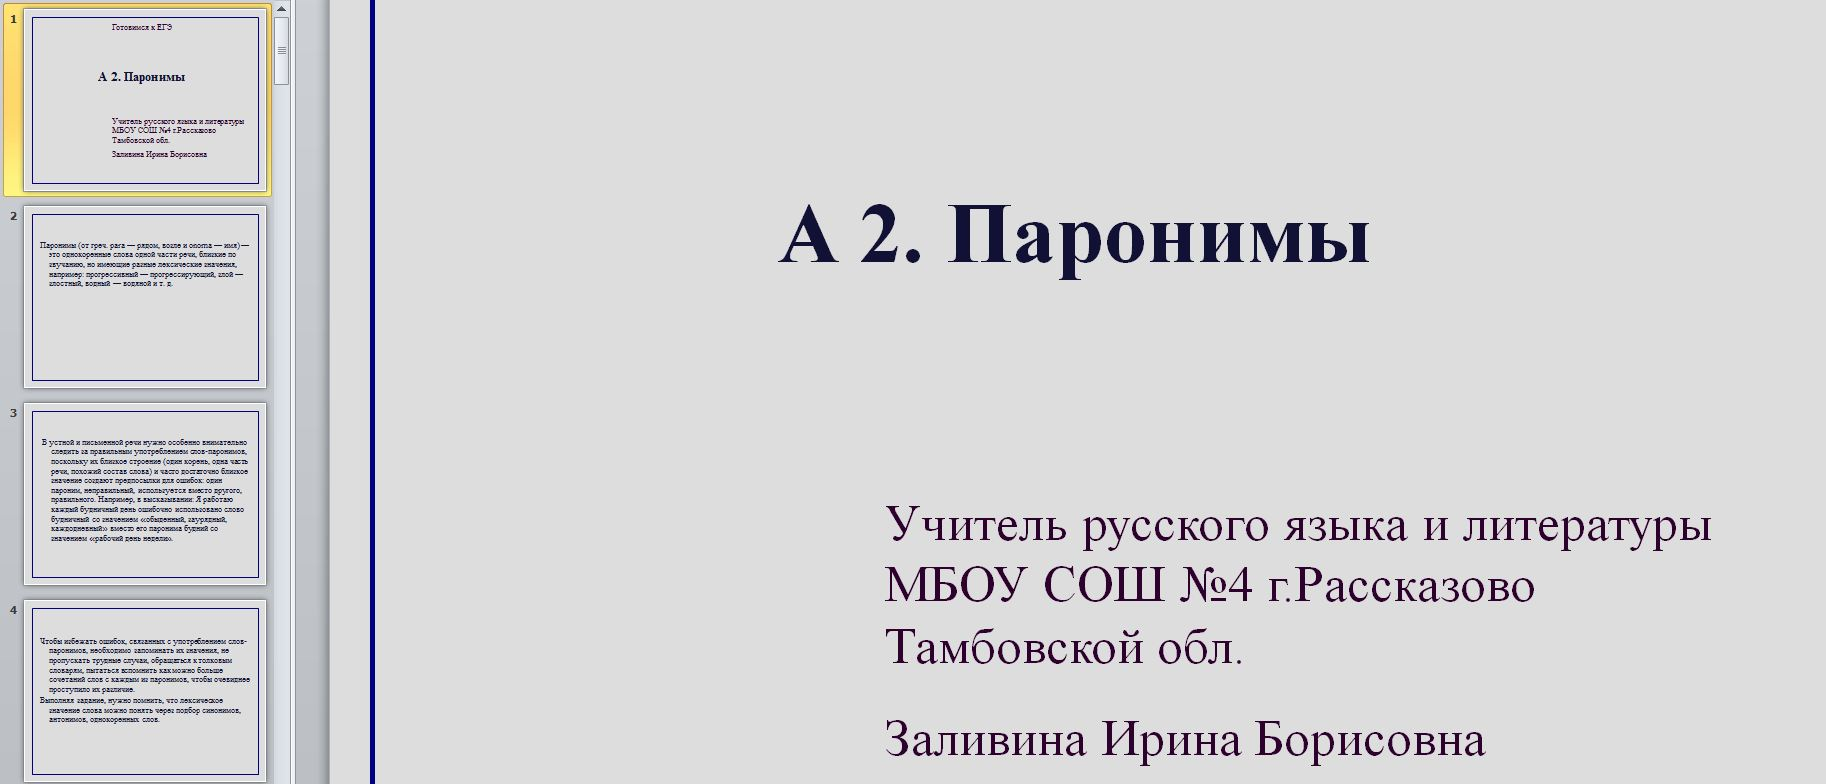 Презентация Паронимы